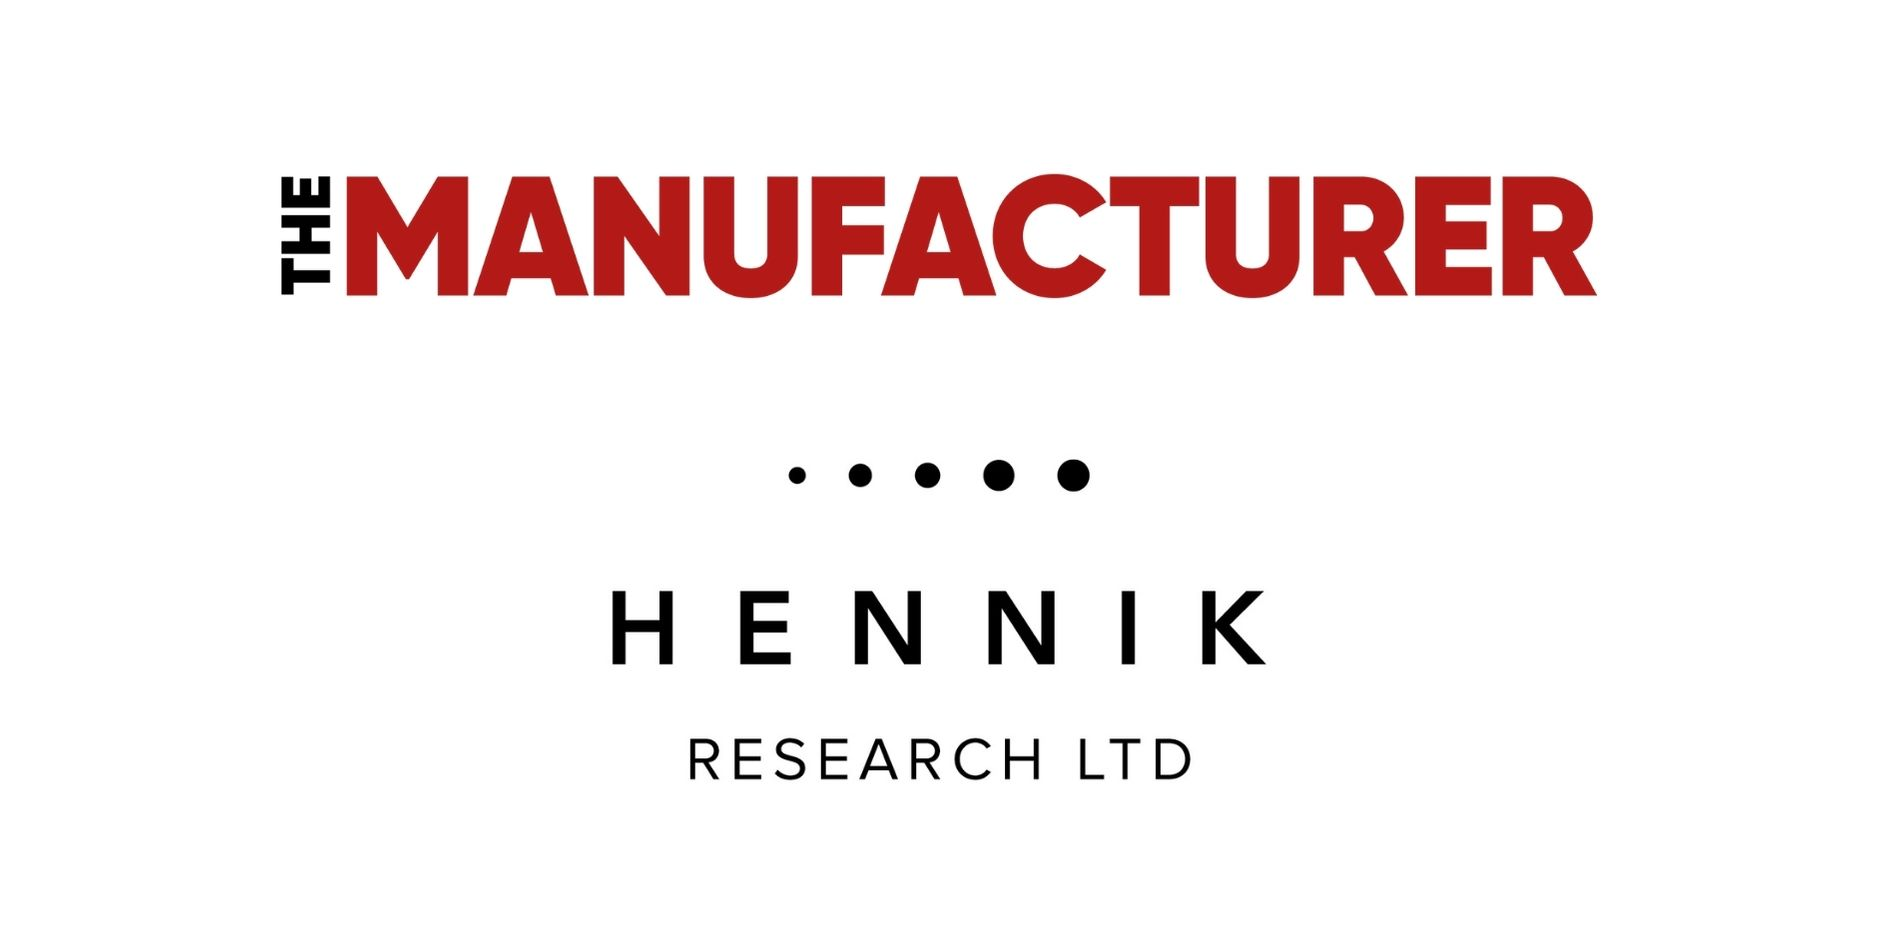 The Manufacturer - Hennik Research